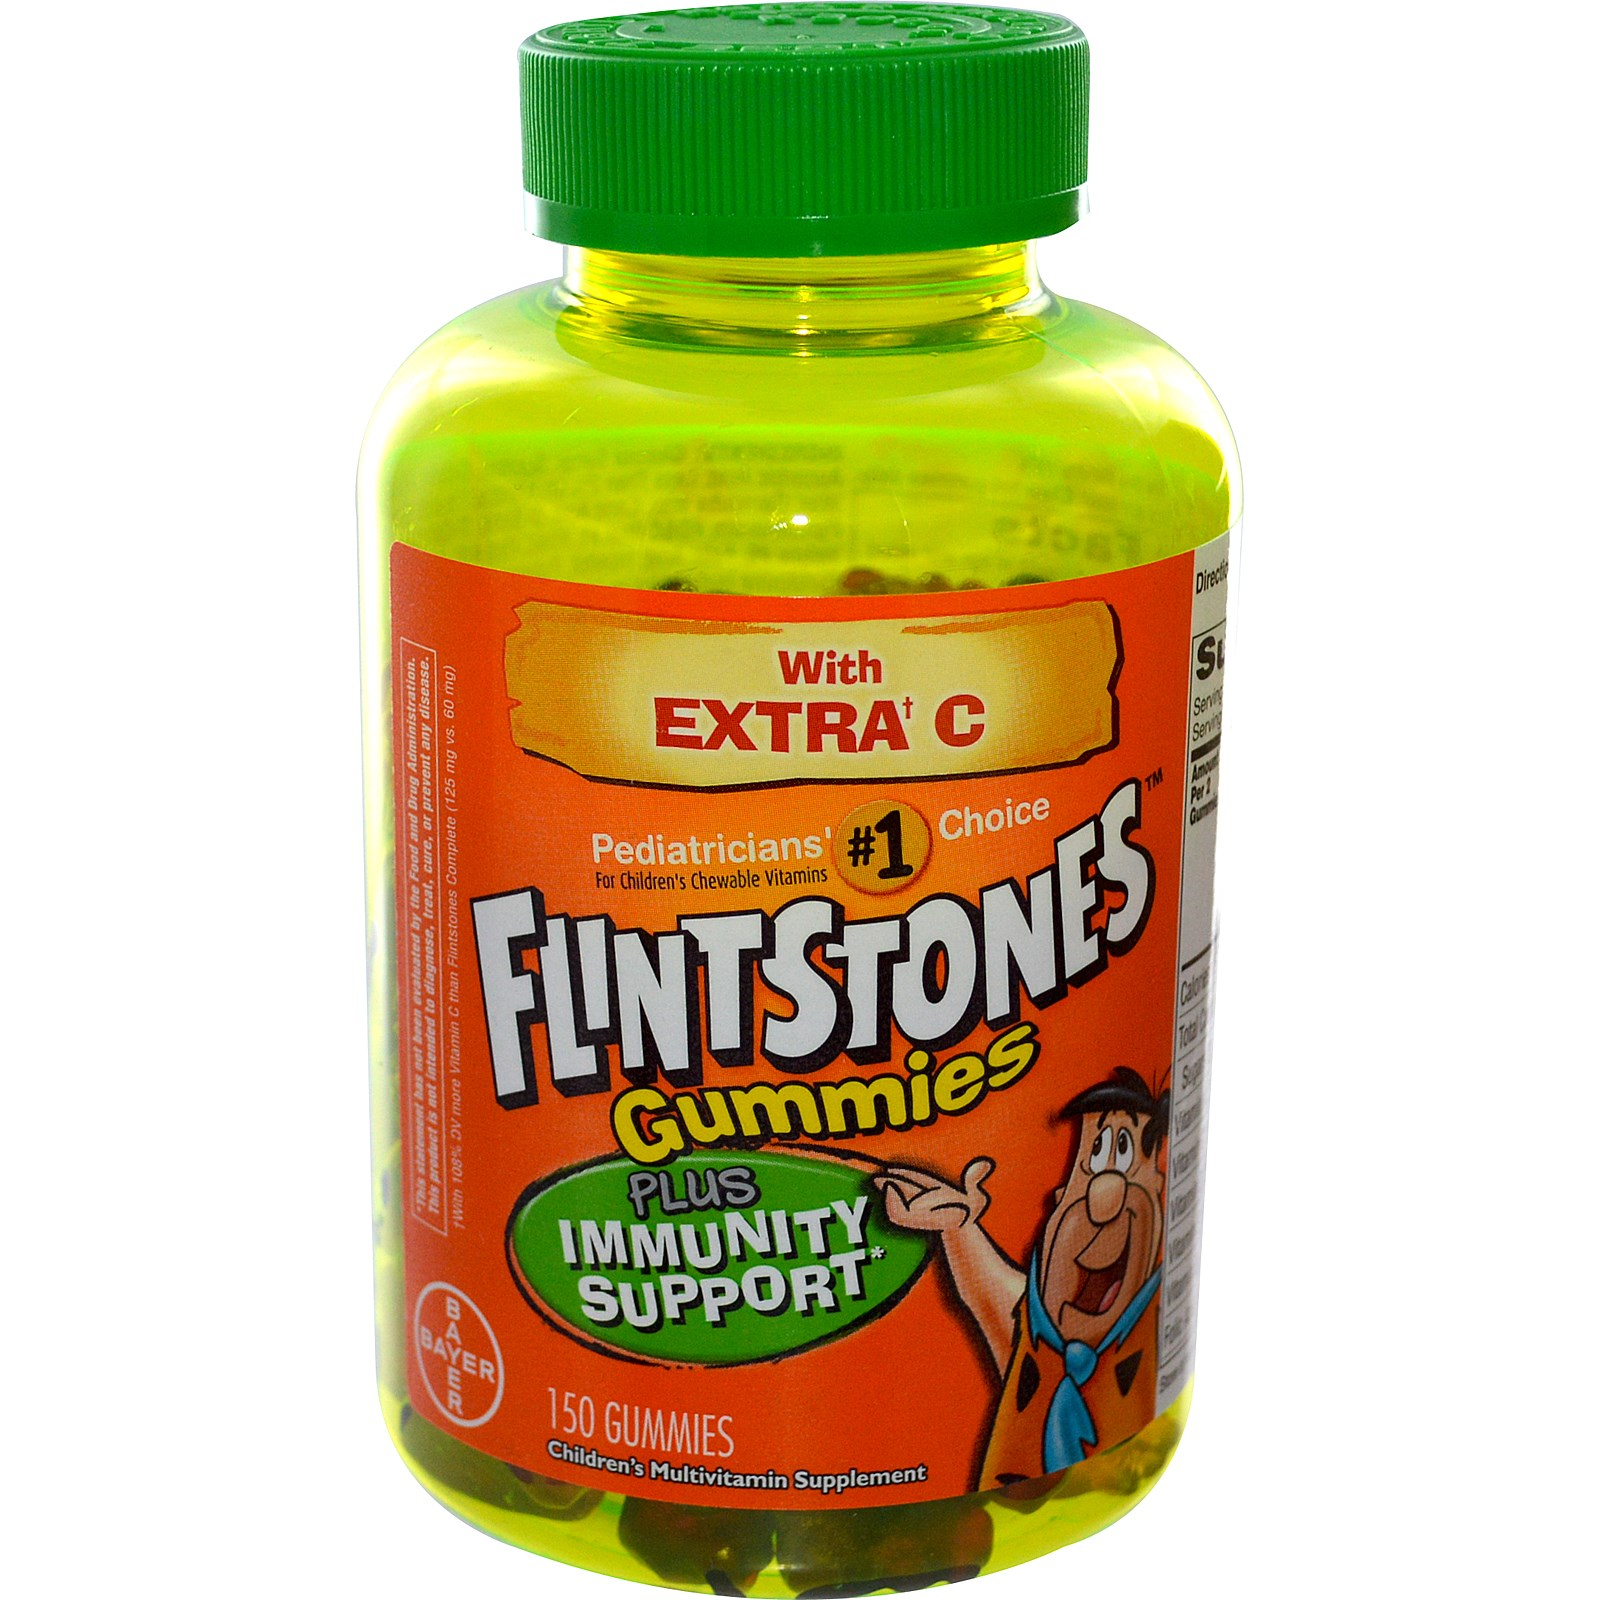 Flintstones multivitamin for adults